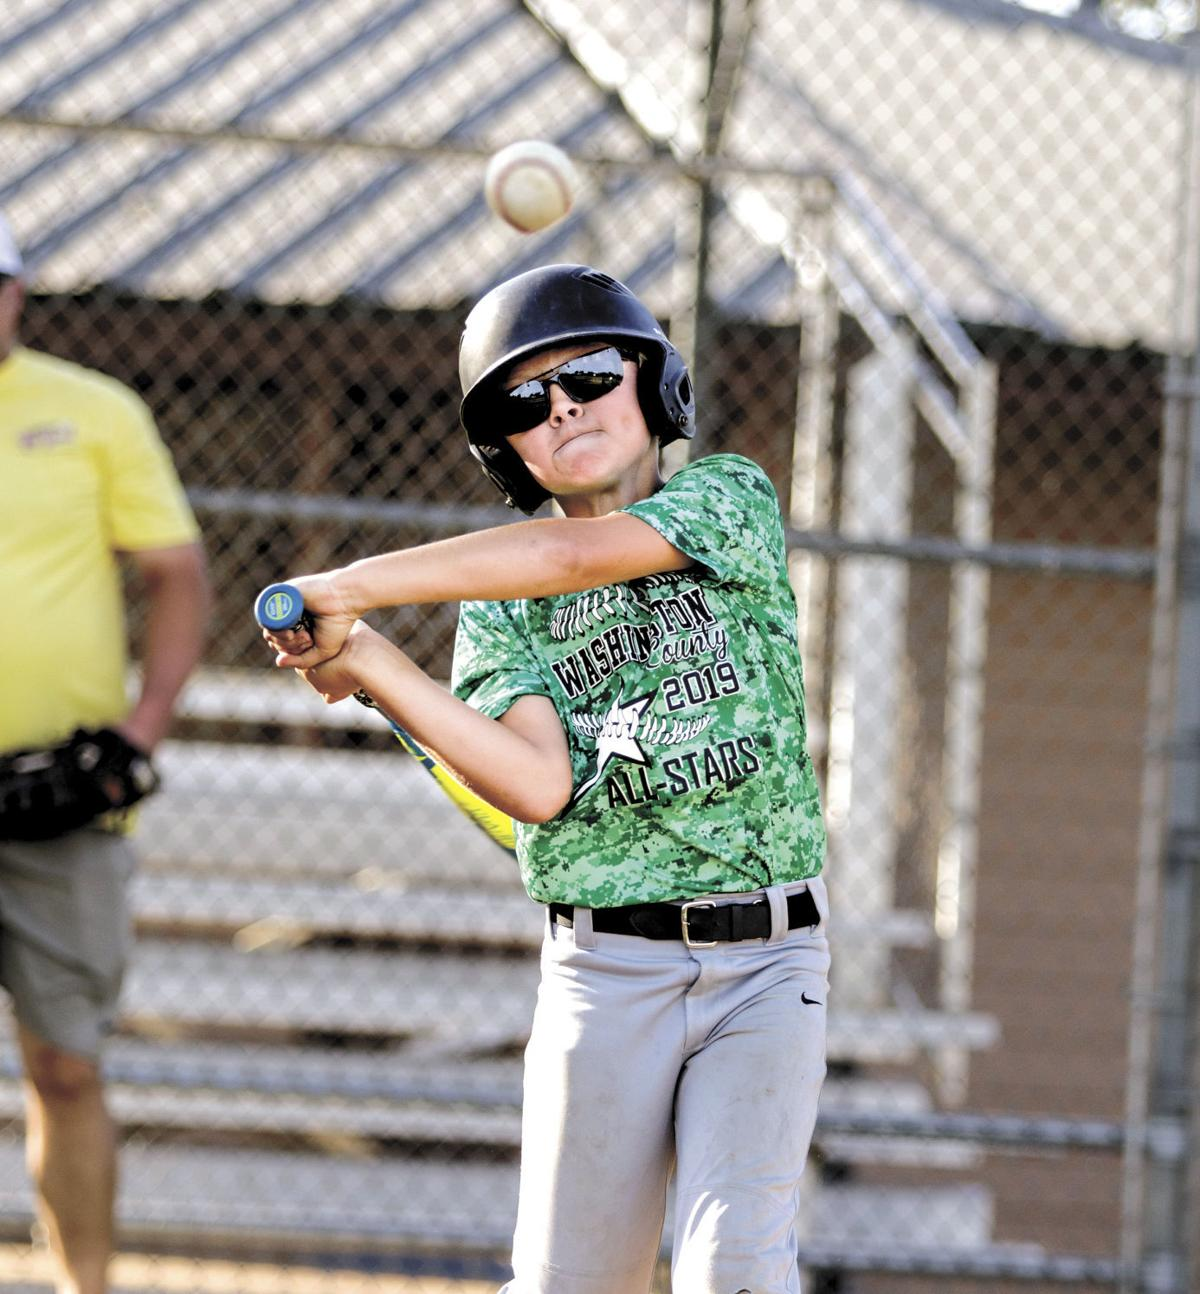 Washington County Little League Minor All-Star Caleb Klussman